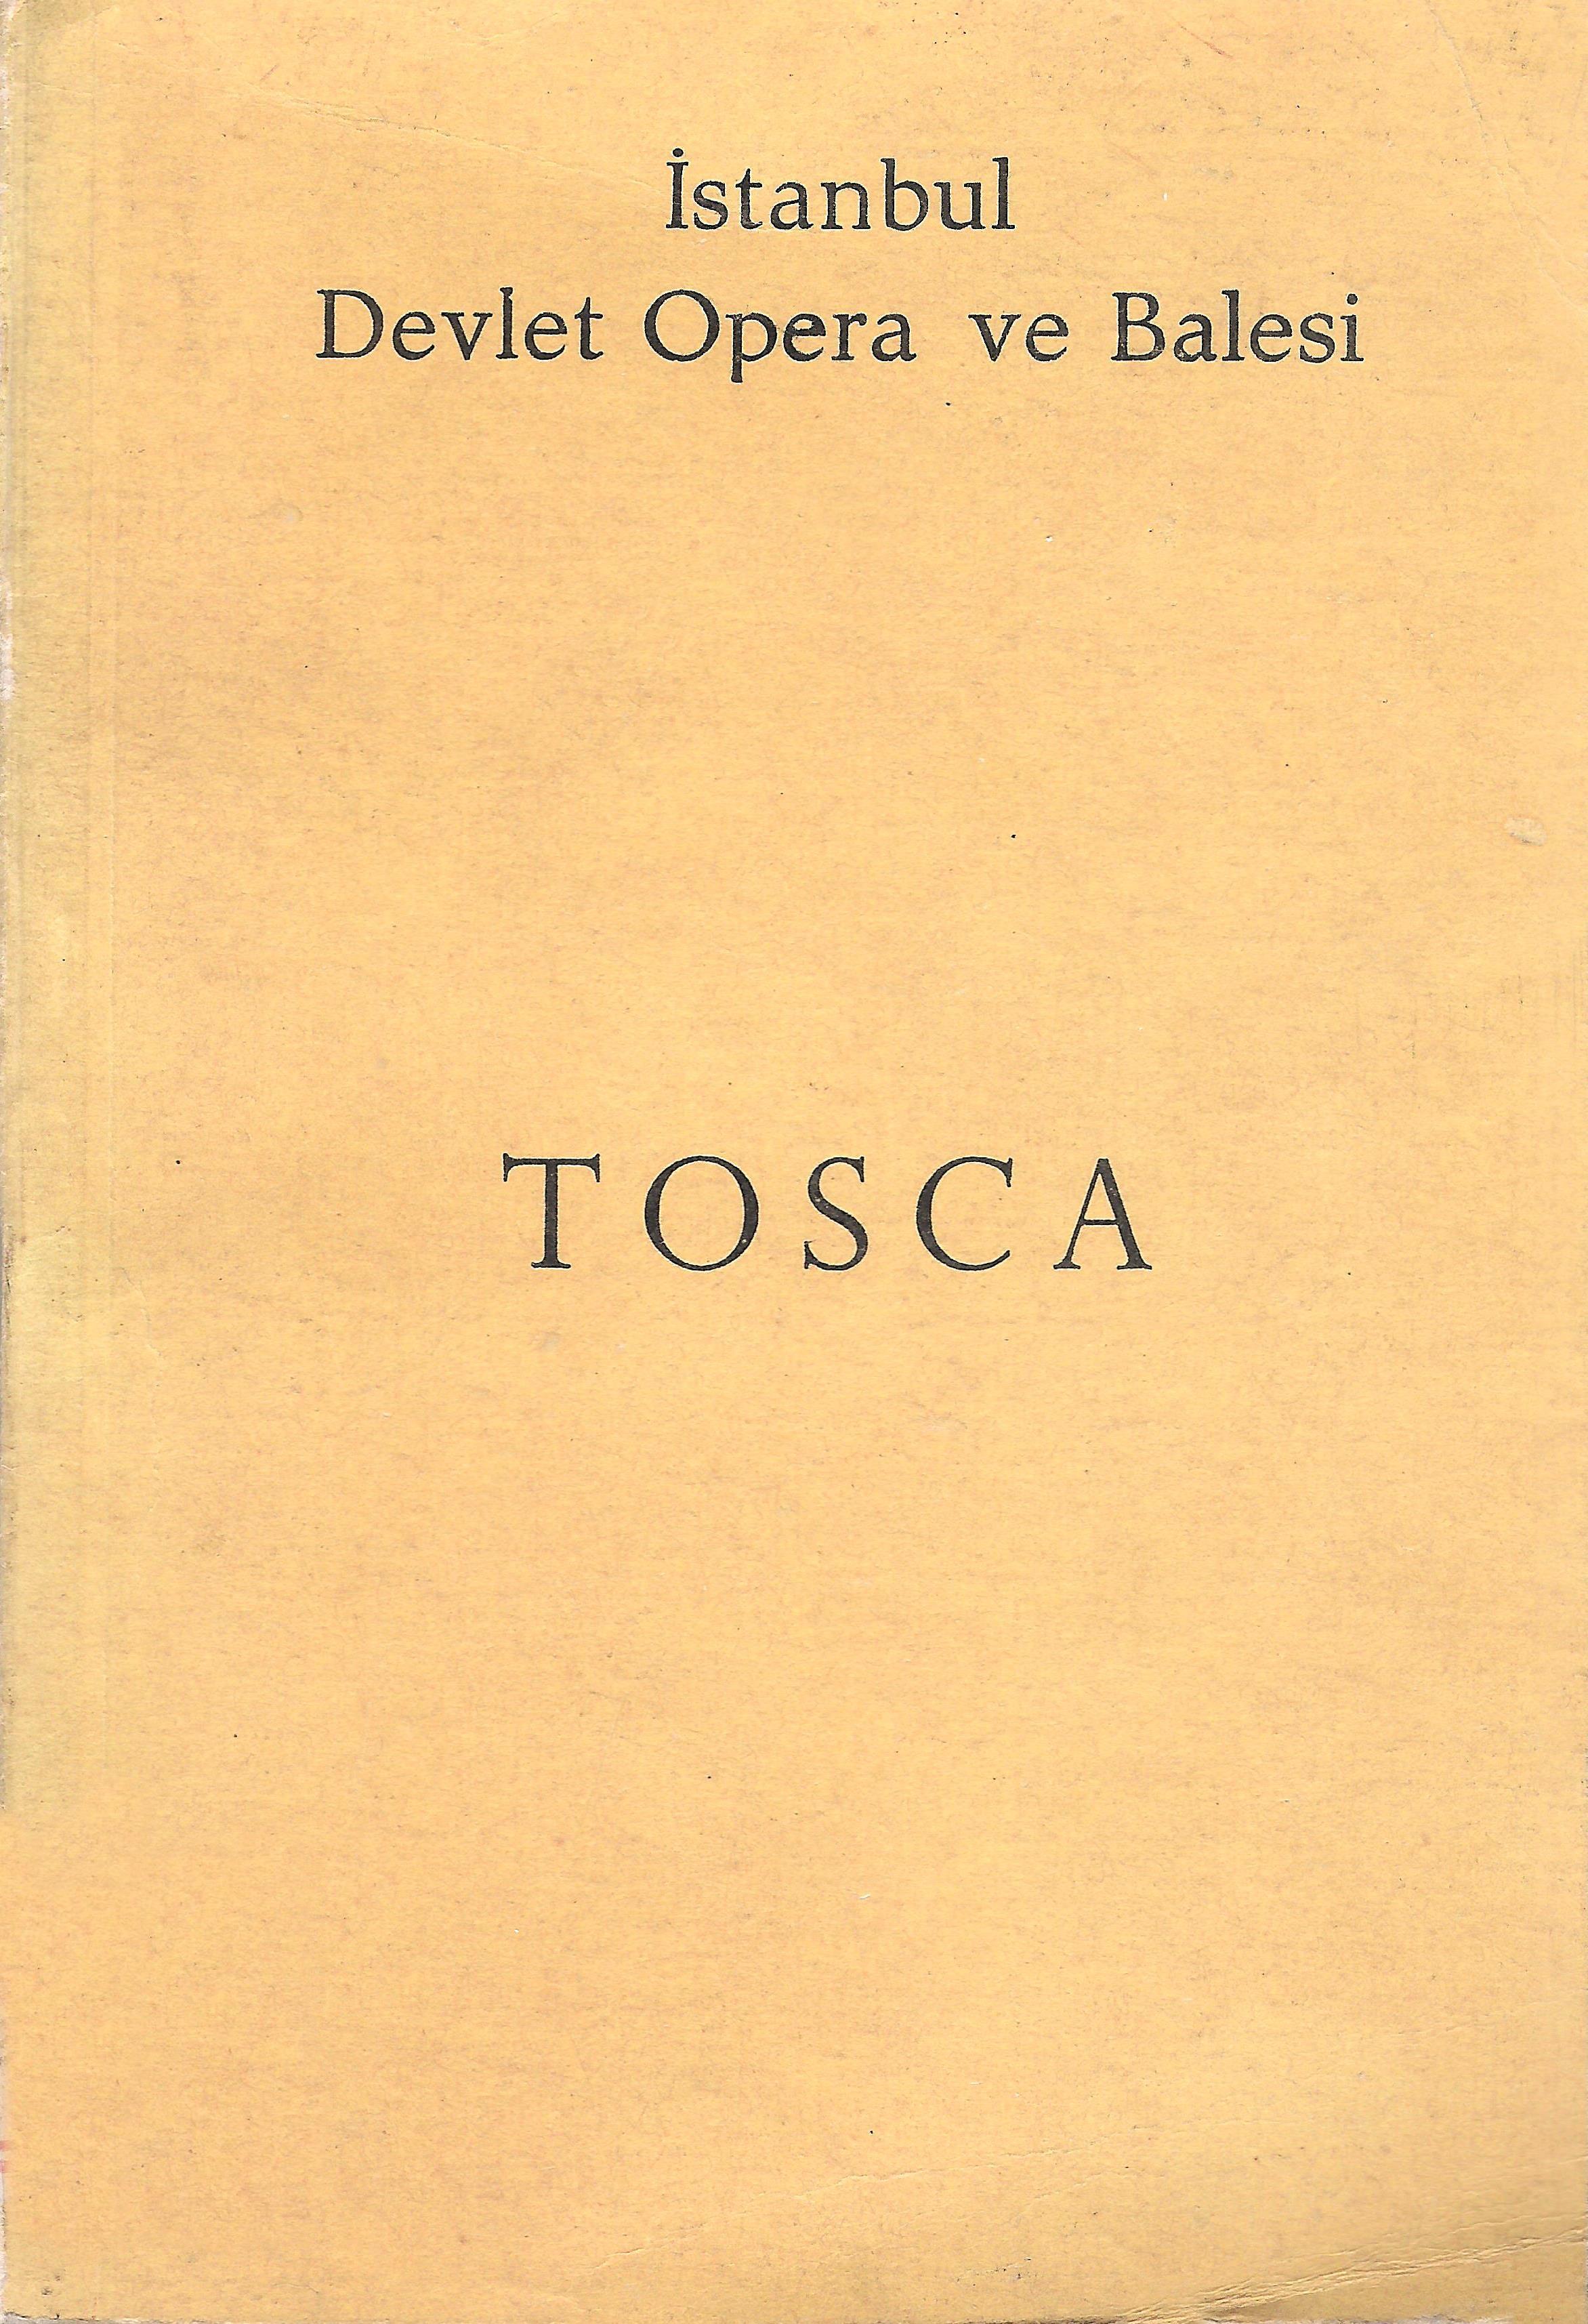 Tosca, İstanbul Devlet Opera ve Balesi